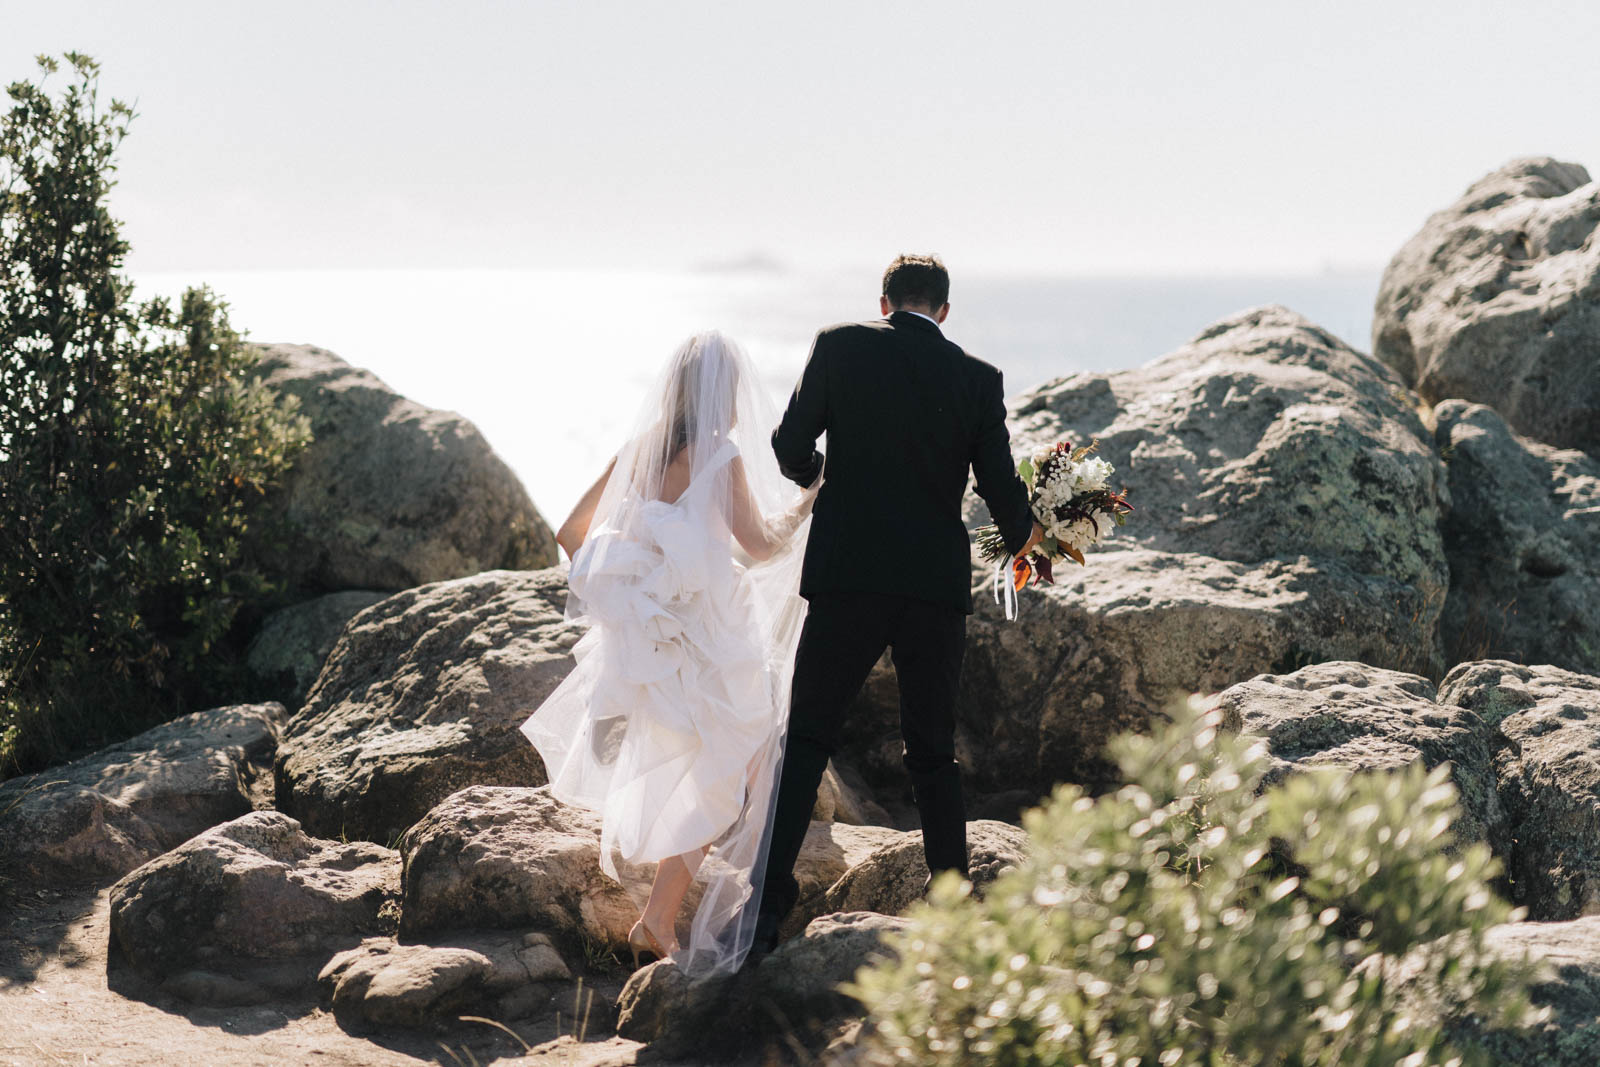 newfound-s-p-mt-maunganui-tauranga-wedding-photographer-1455-A9_04825